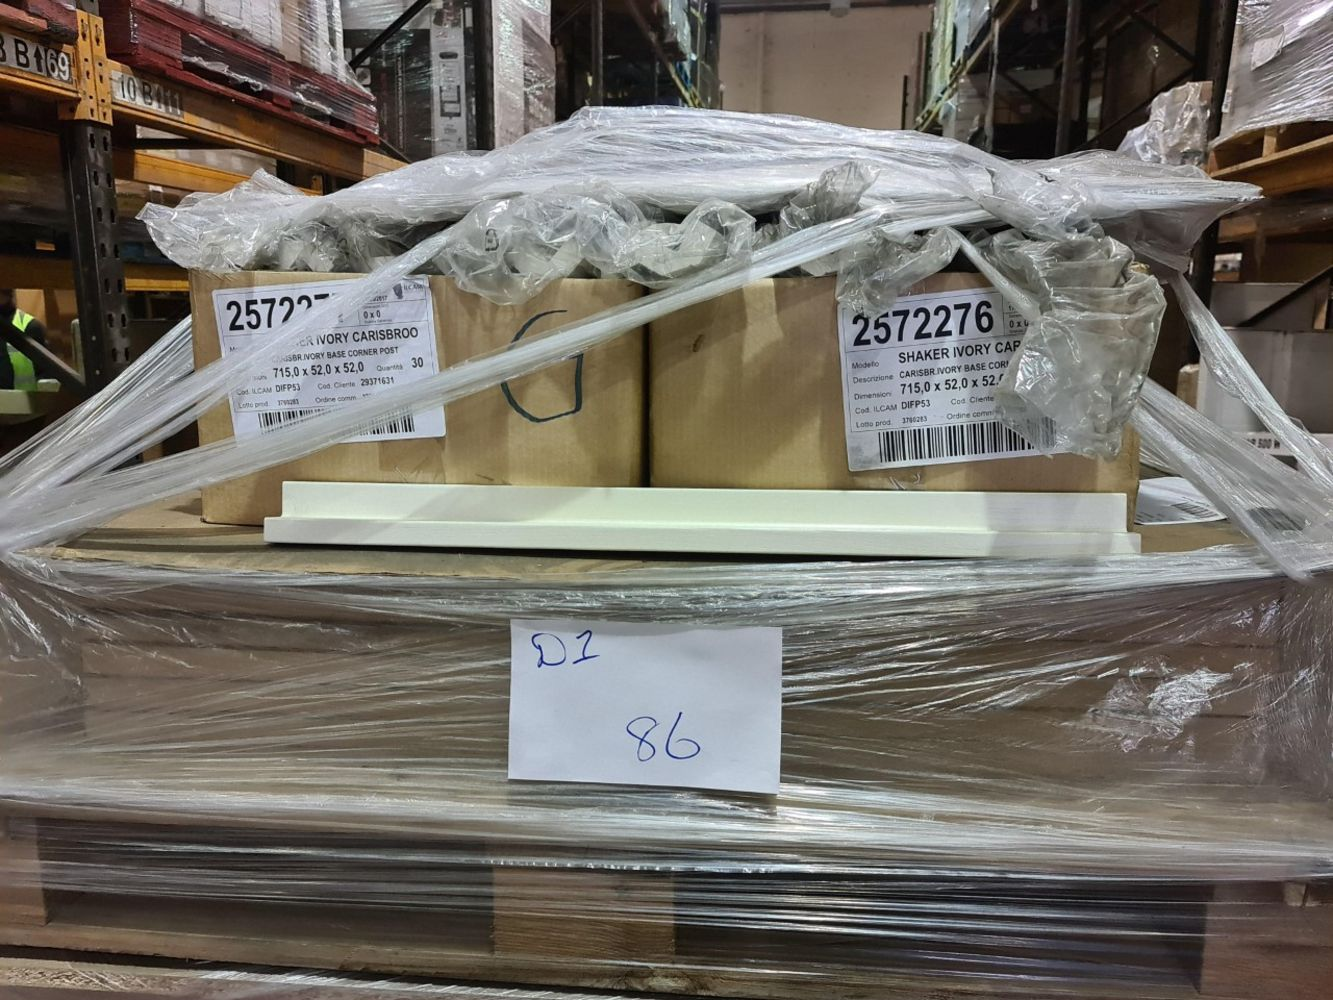 Pallets of DIY, Kitchen Goods, Screws, Bolts, Lightbulbs, Household Goods